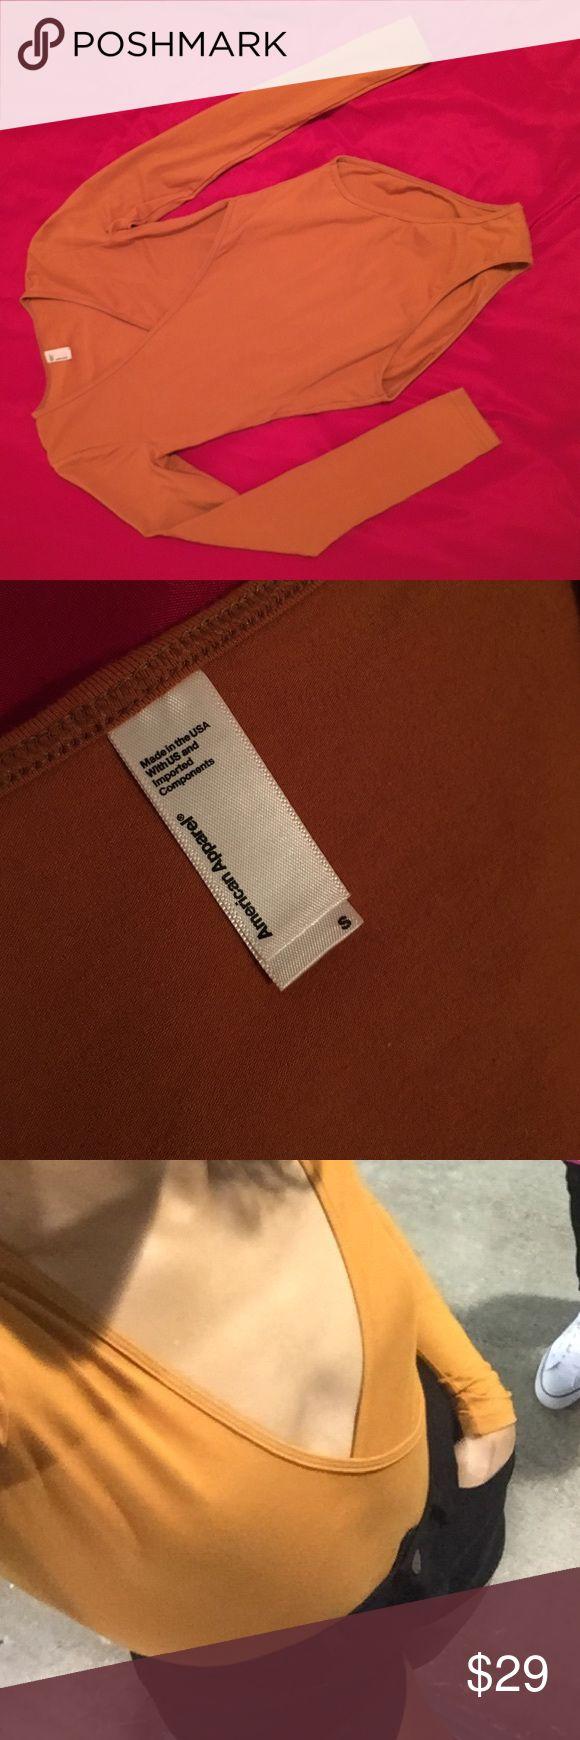 American Apparel long sleeve bodysuit Mustard yellow, American Apparel l/s bodysuit American Apparel Other